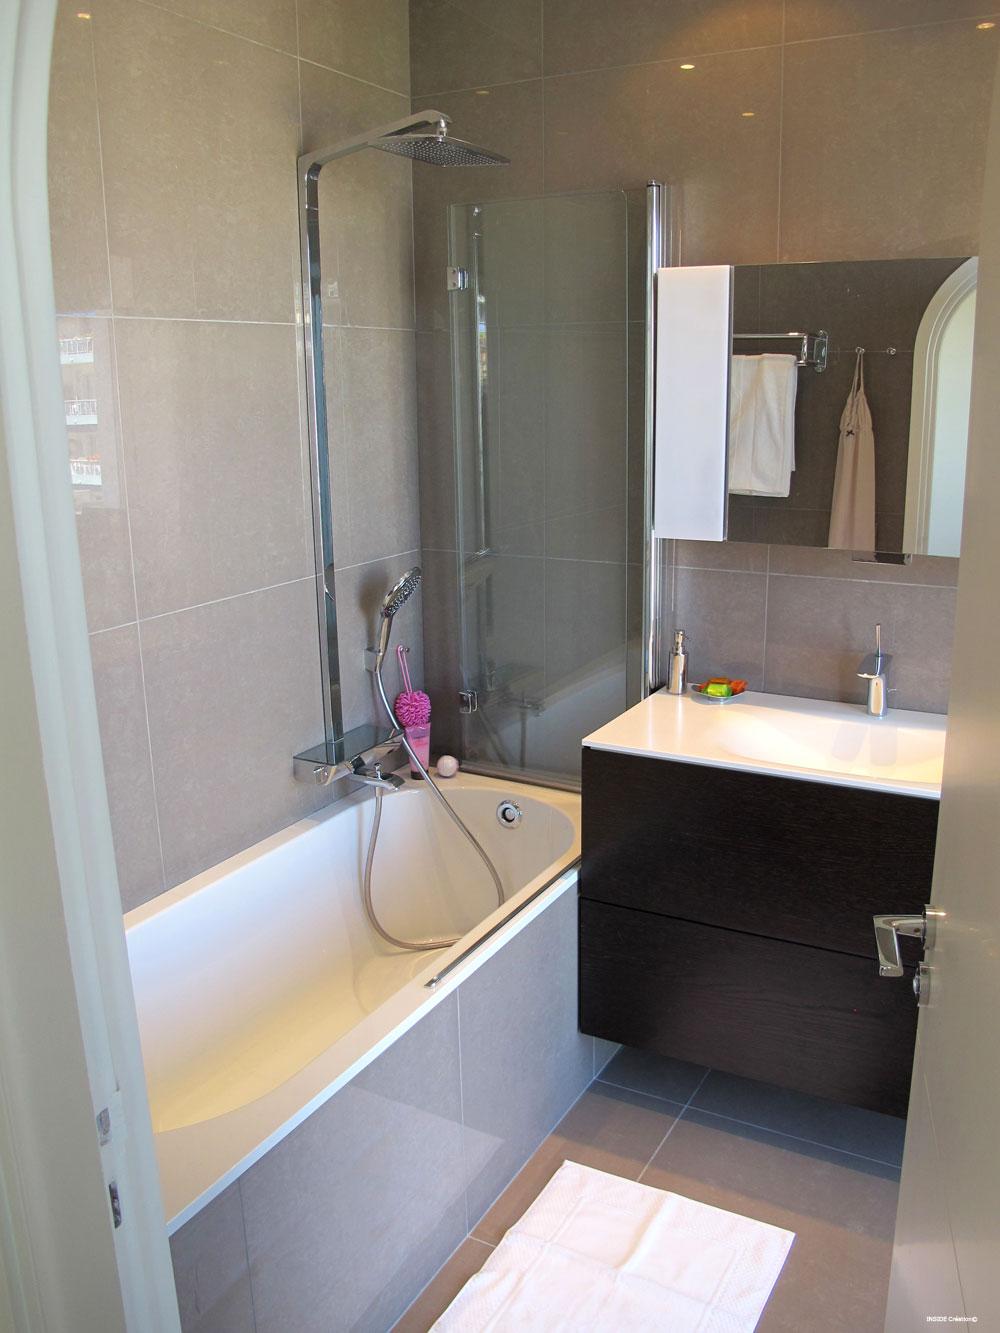 Salle de bain  baignoire en quaryl  INSIDE Cration Nice